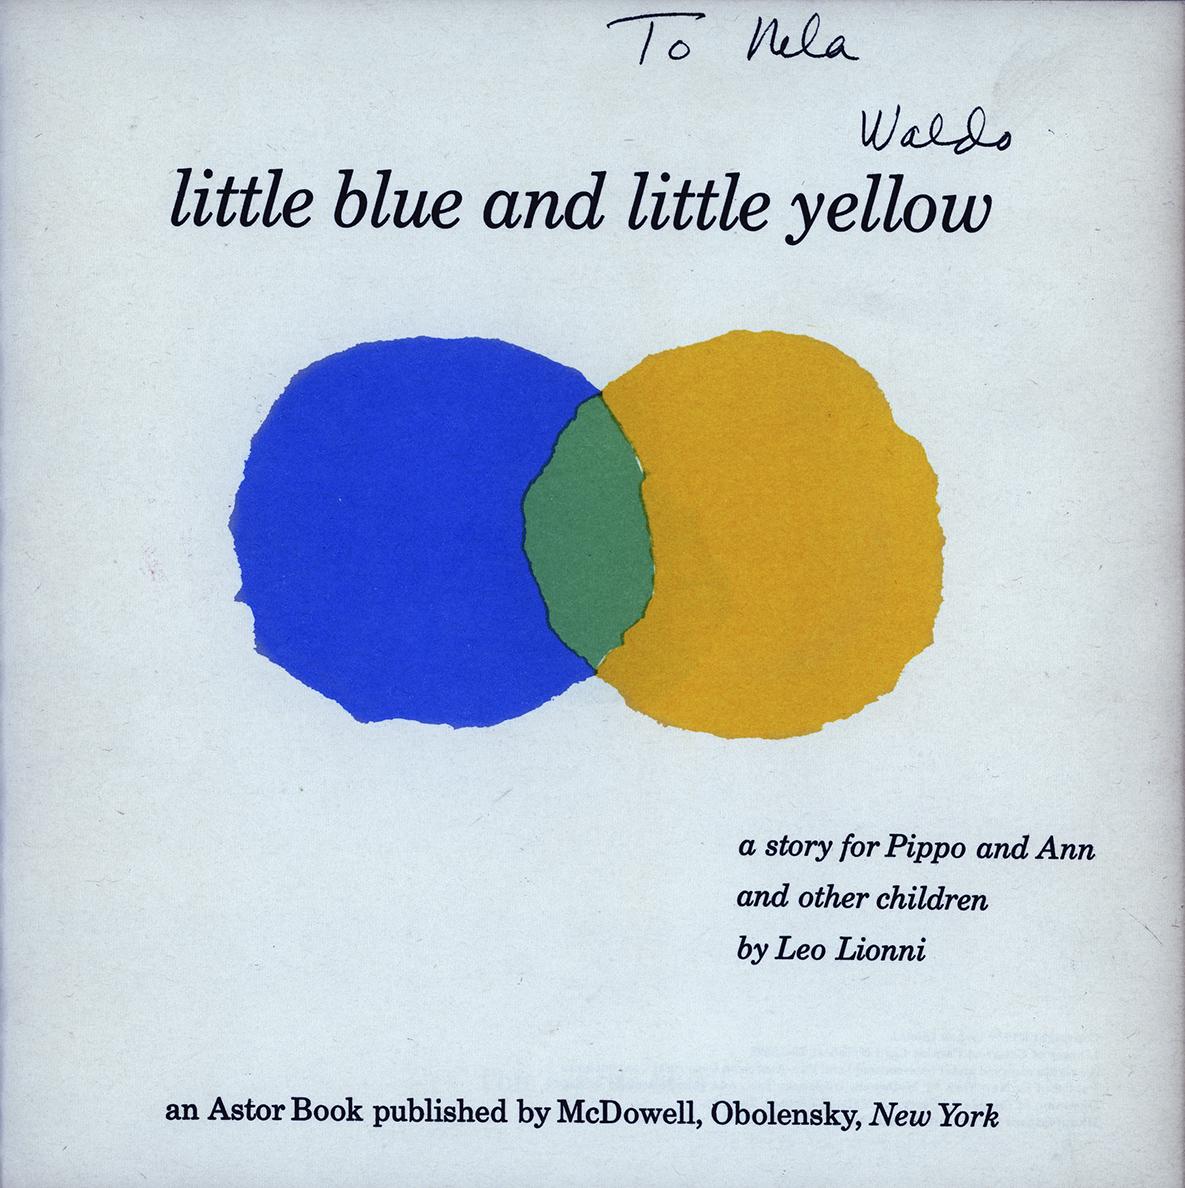 Waldo Balart gives Leo Lionni's first children's book to Nela Arias Misson